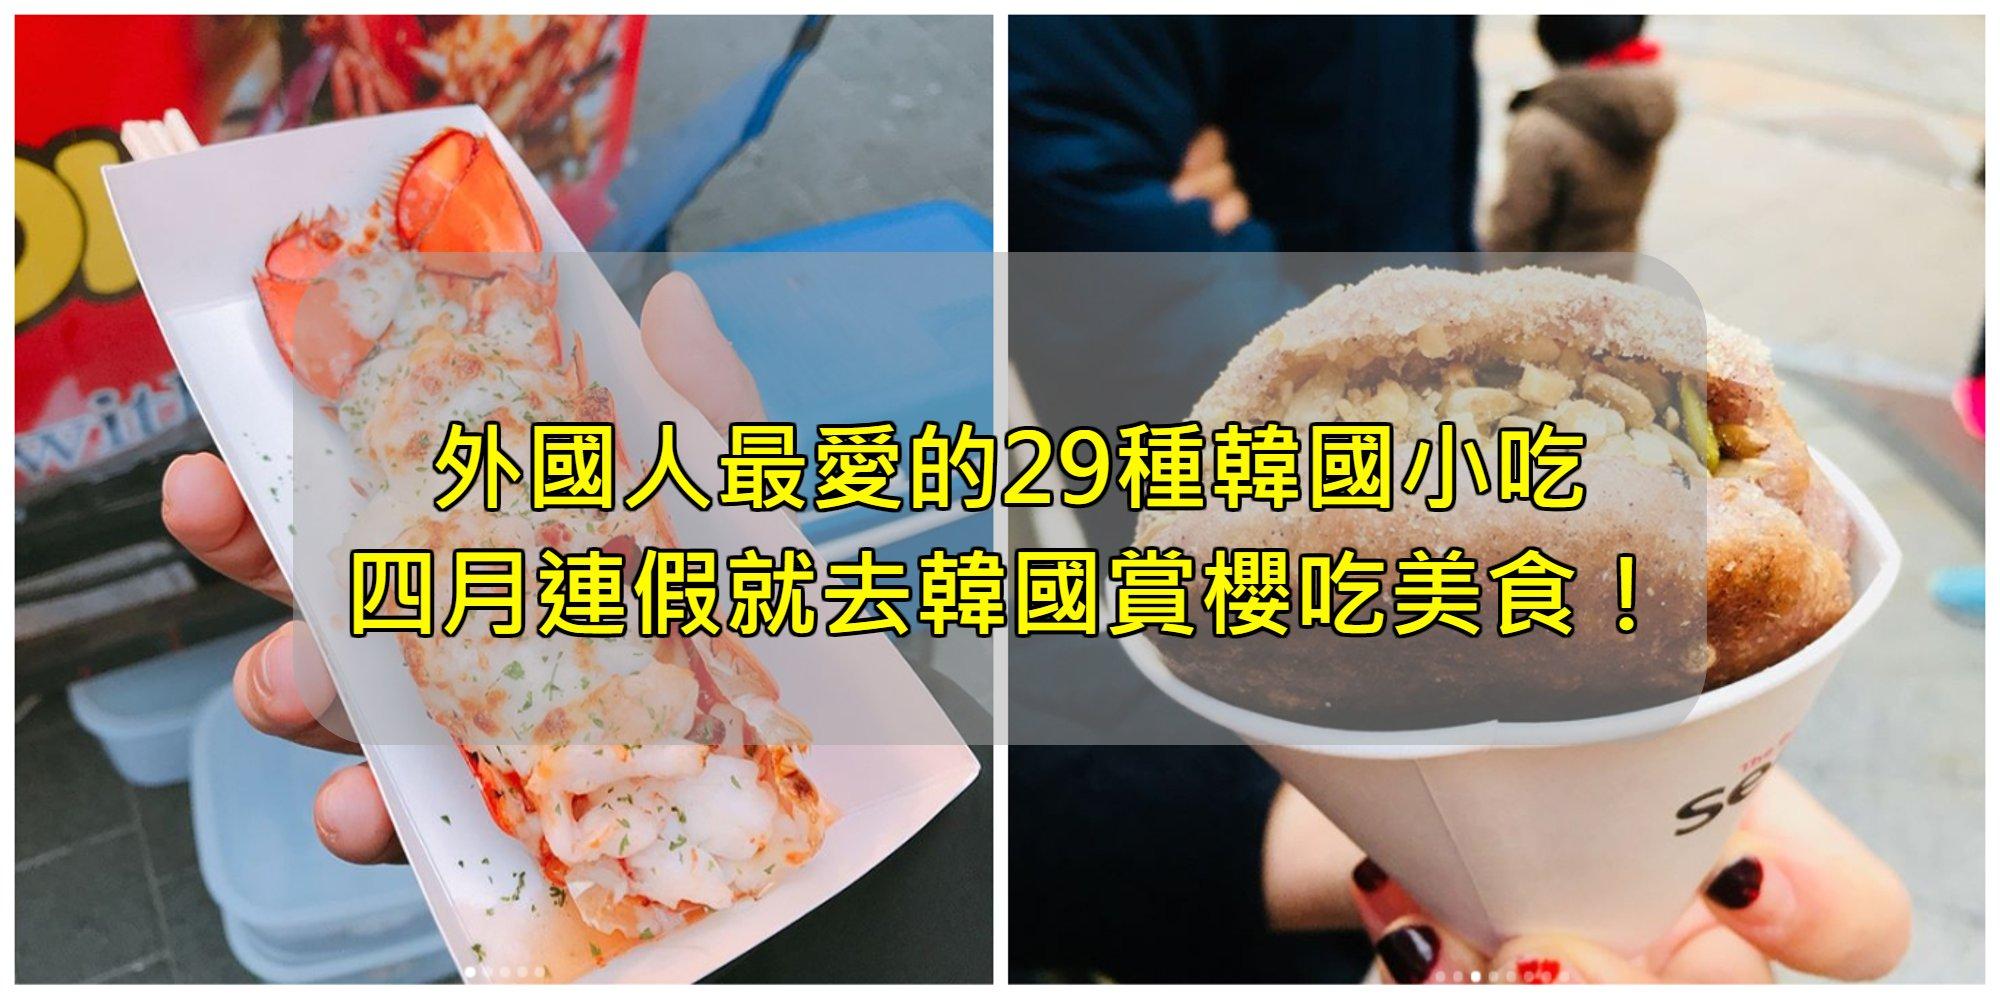 e59c96e789871.png?resize=412,275 - 新亞洲美食王國?外國人認證29種神好吃的韓國街頭美食大盤點!